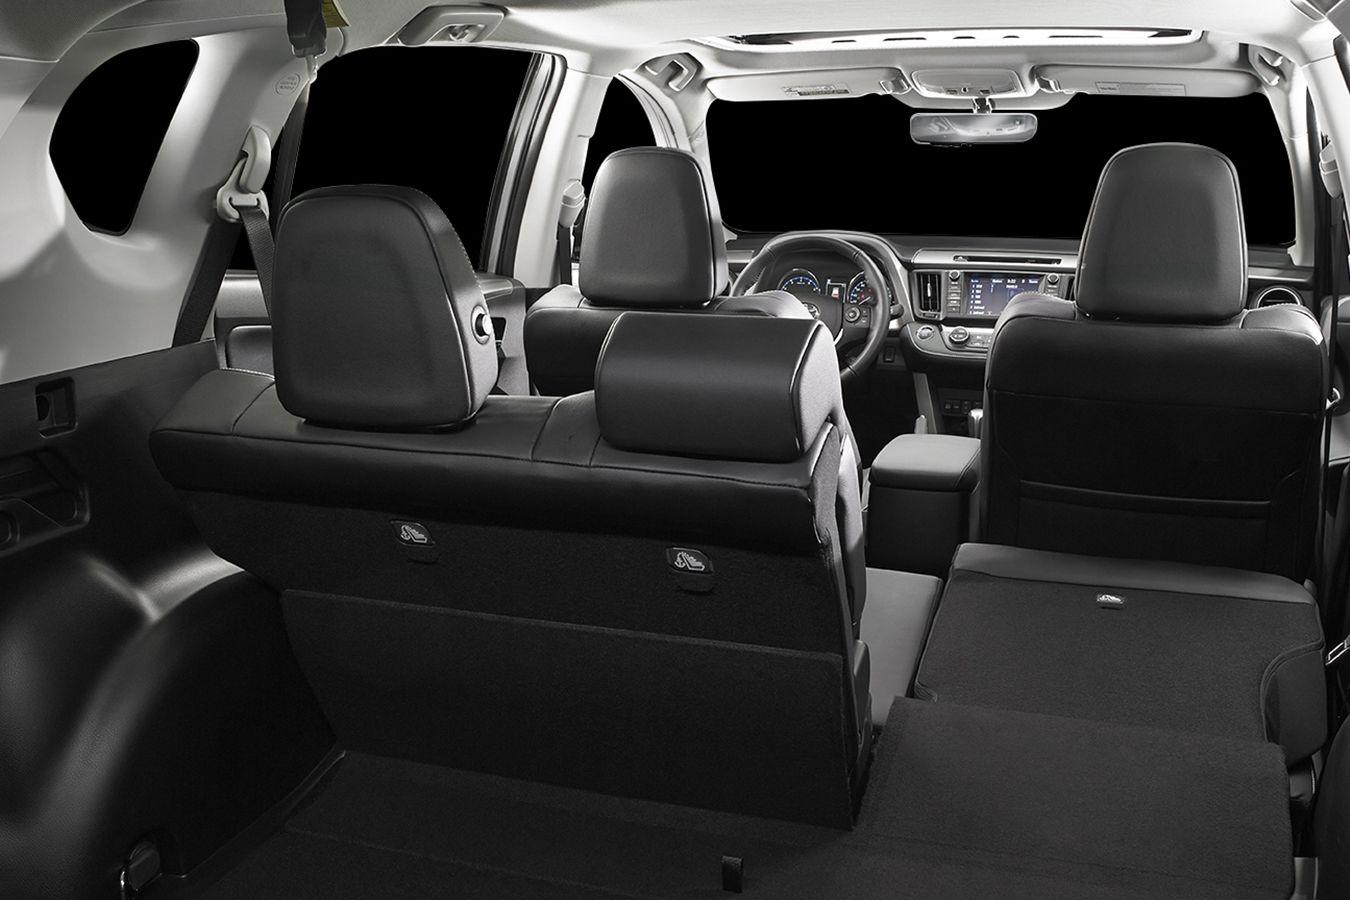 Toyota RAV4 2018 compartimiento trasero